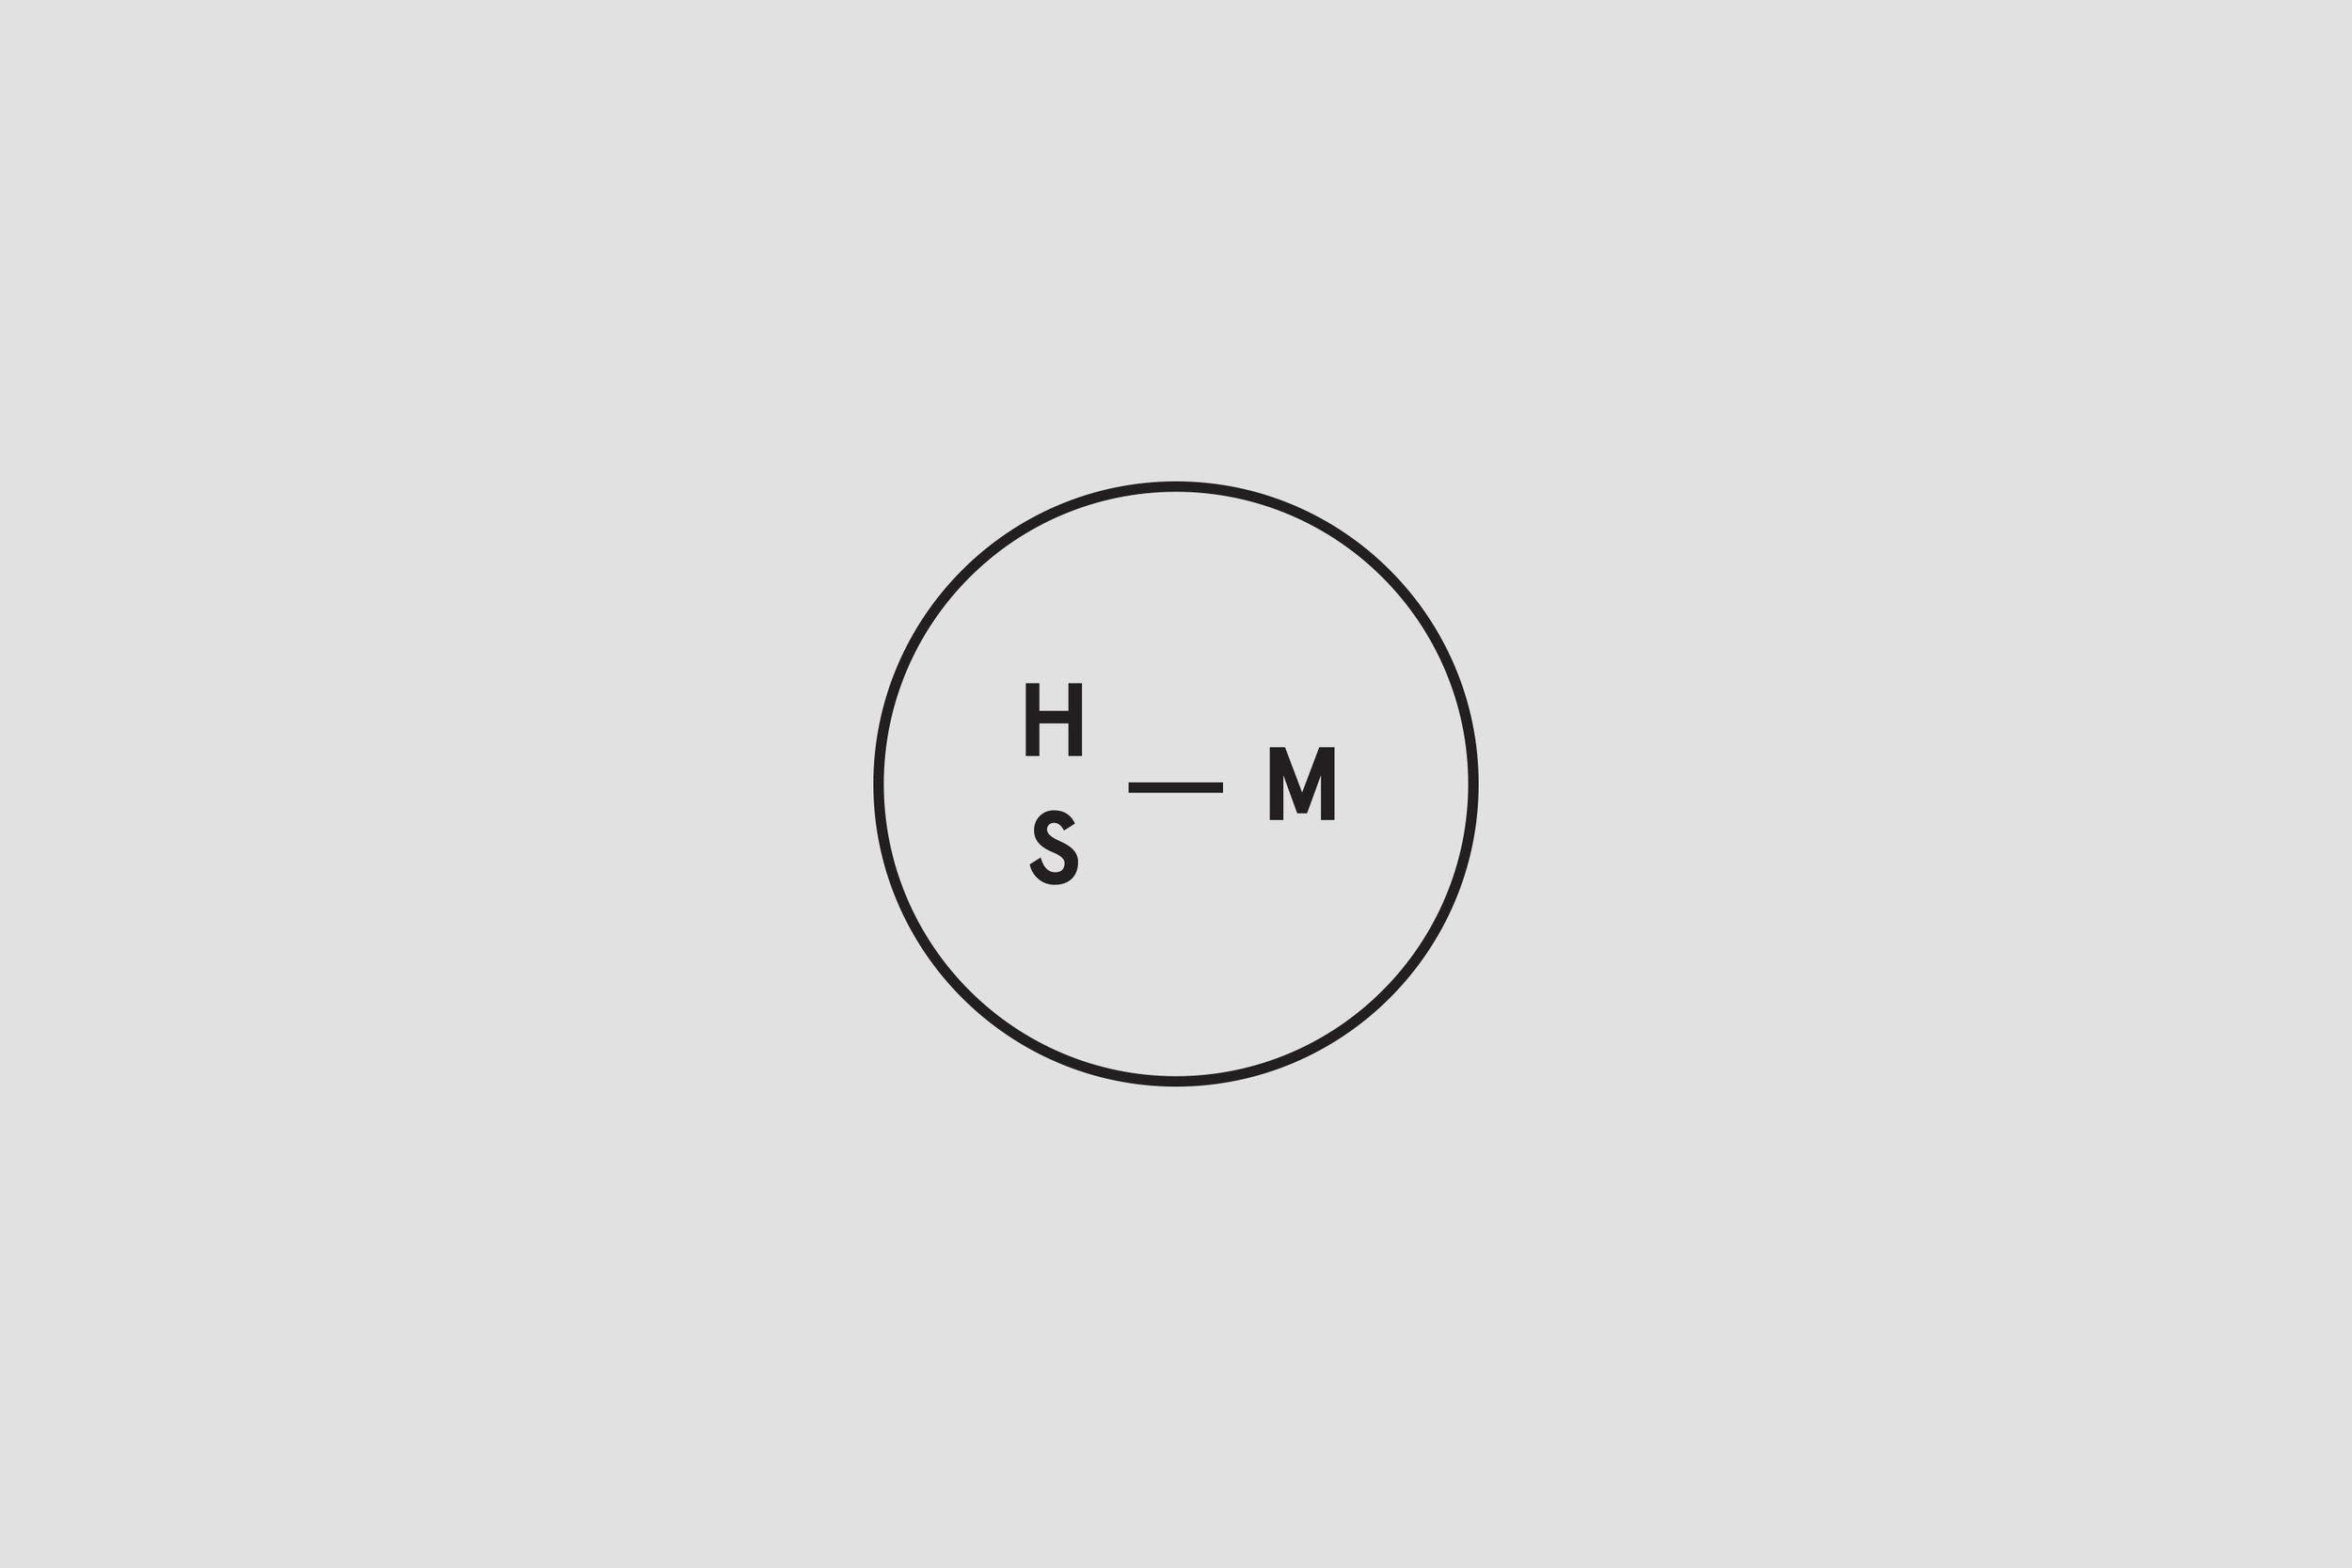 HMSM_Folio_logo2.jpg